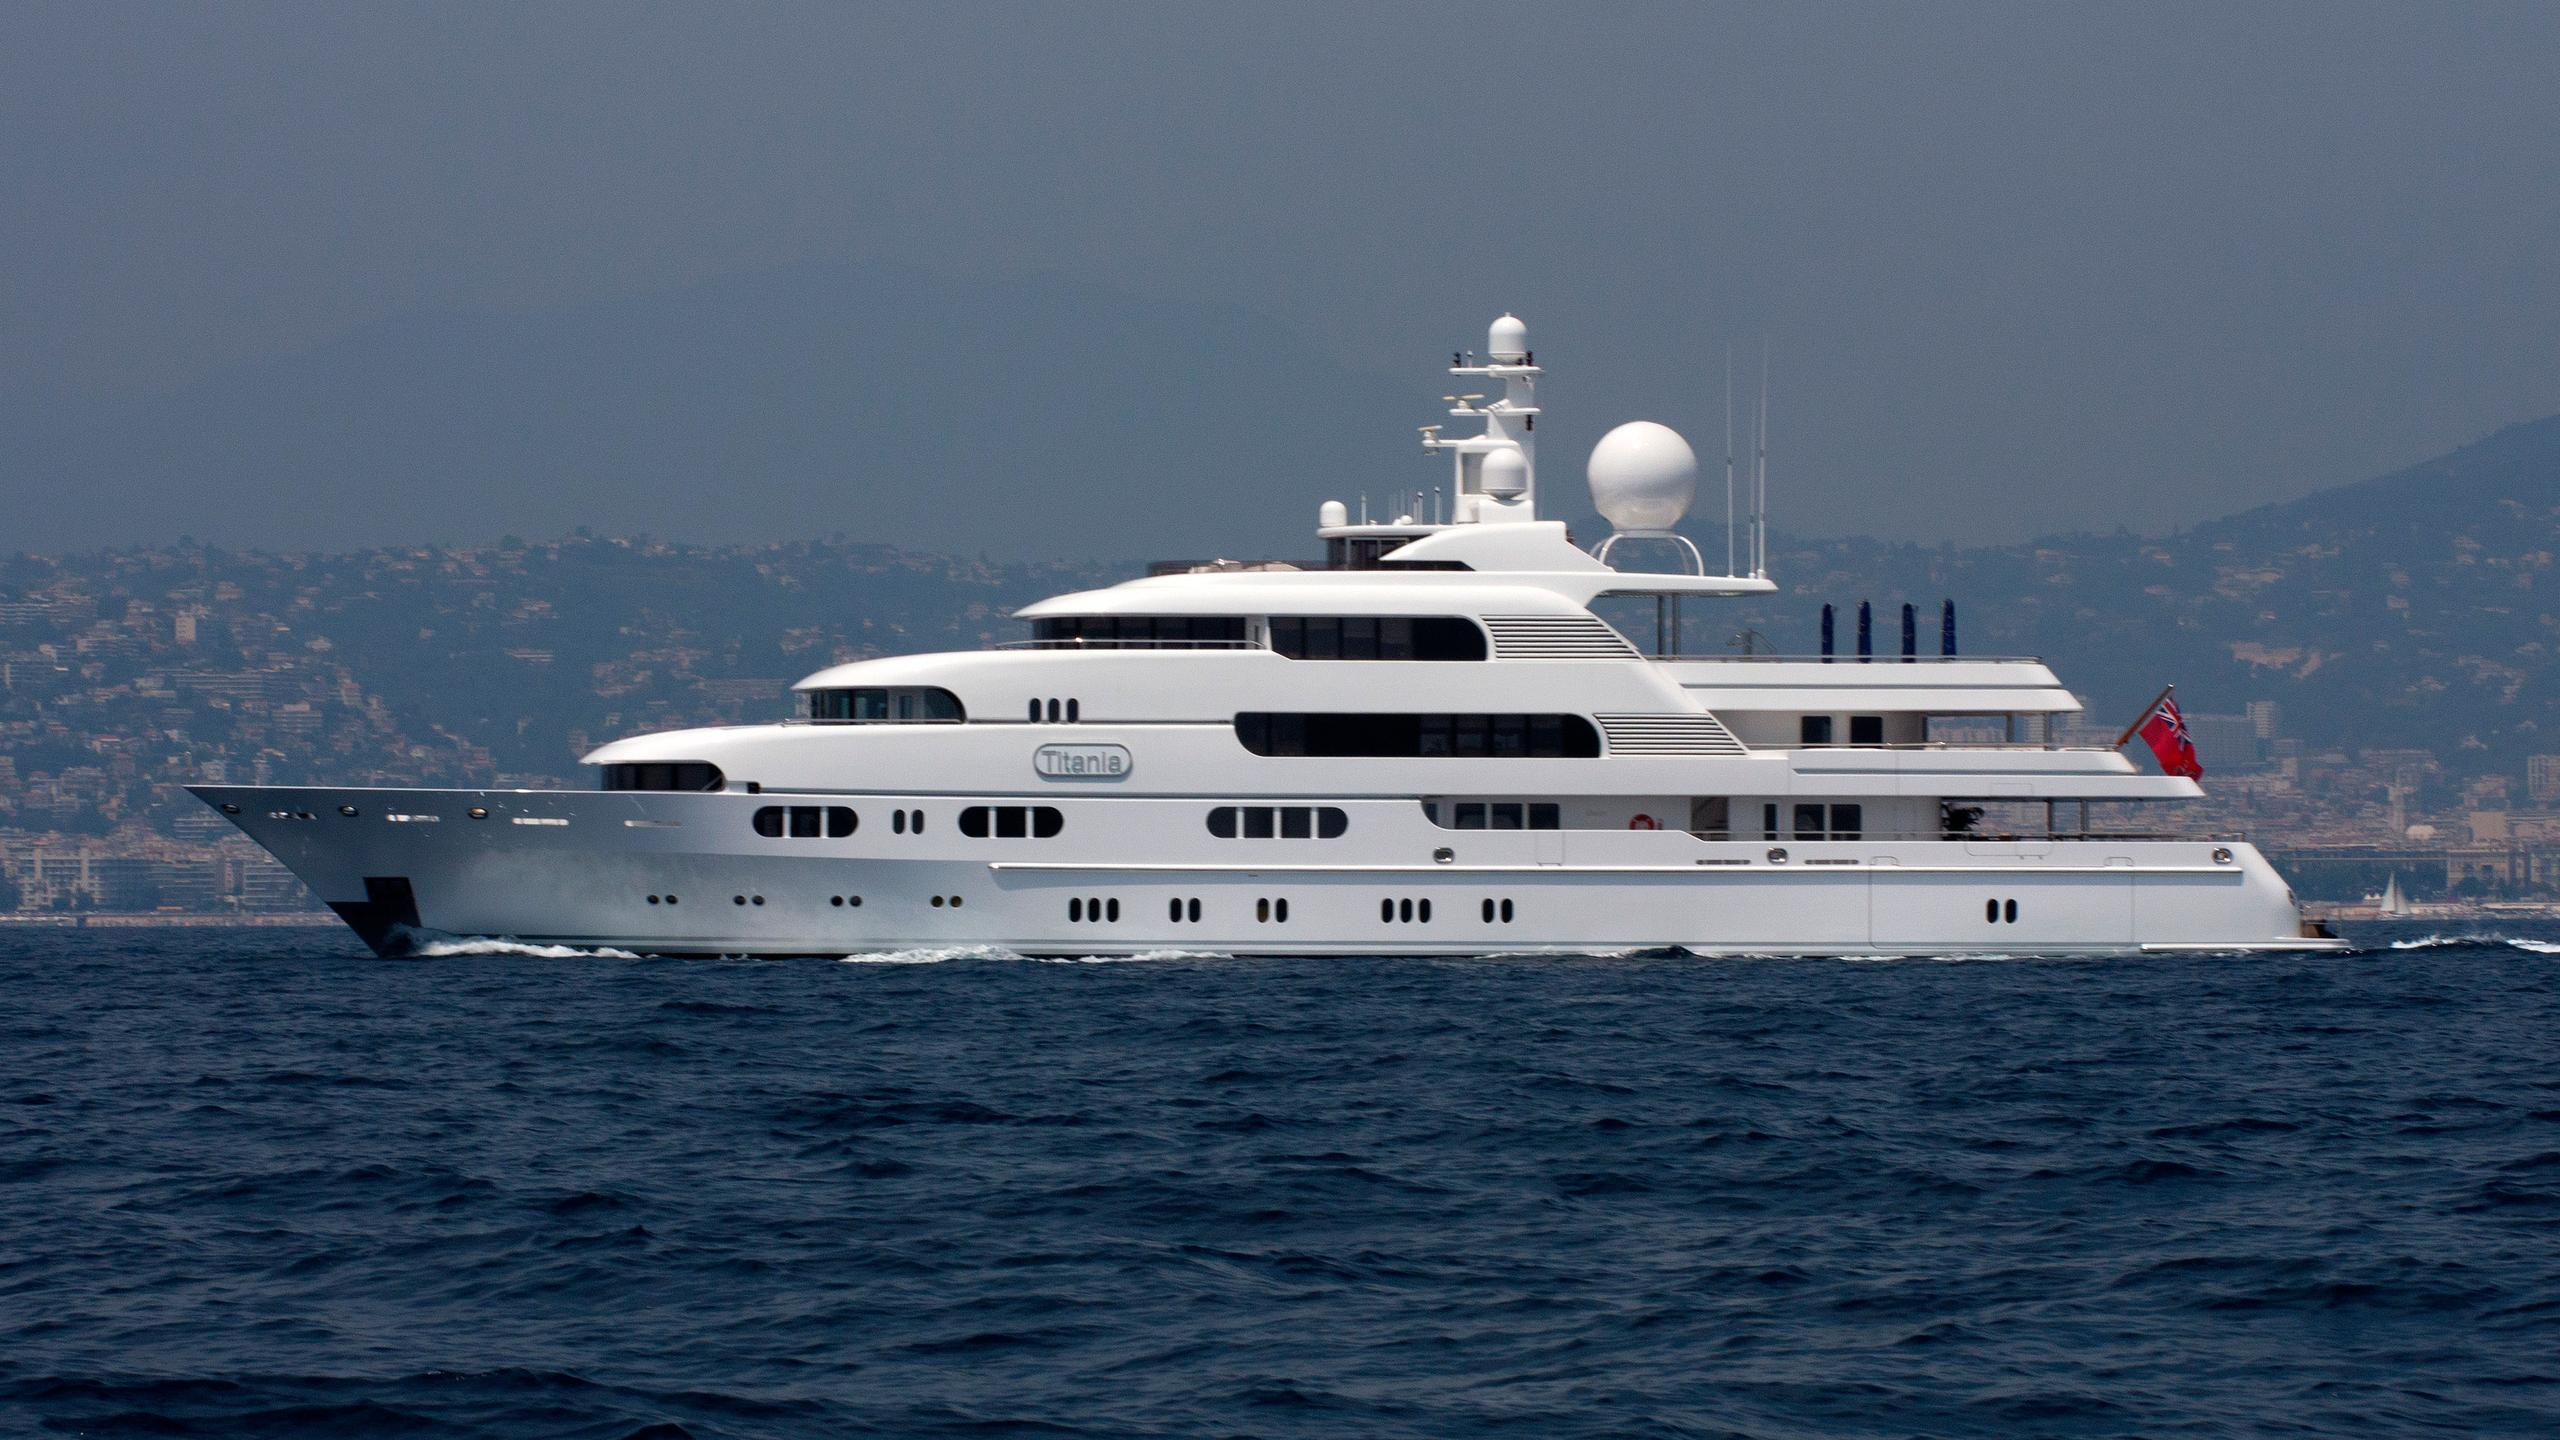 titania-motor-yacht-lurssen-2006-72m-profile